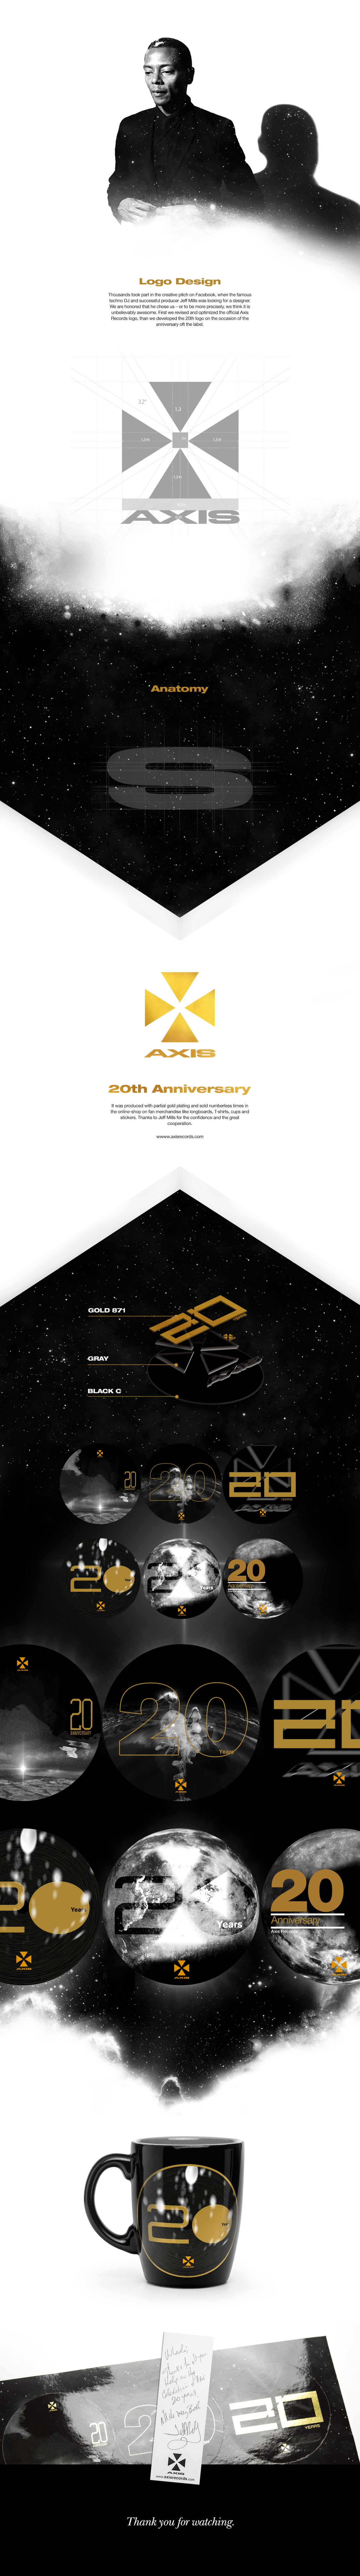 JEFF MILLS Axis Records detroit Spektrum 44 design logo brand identity gold foil Space